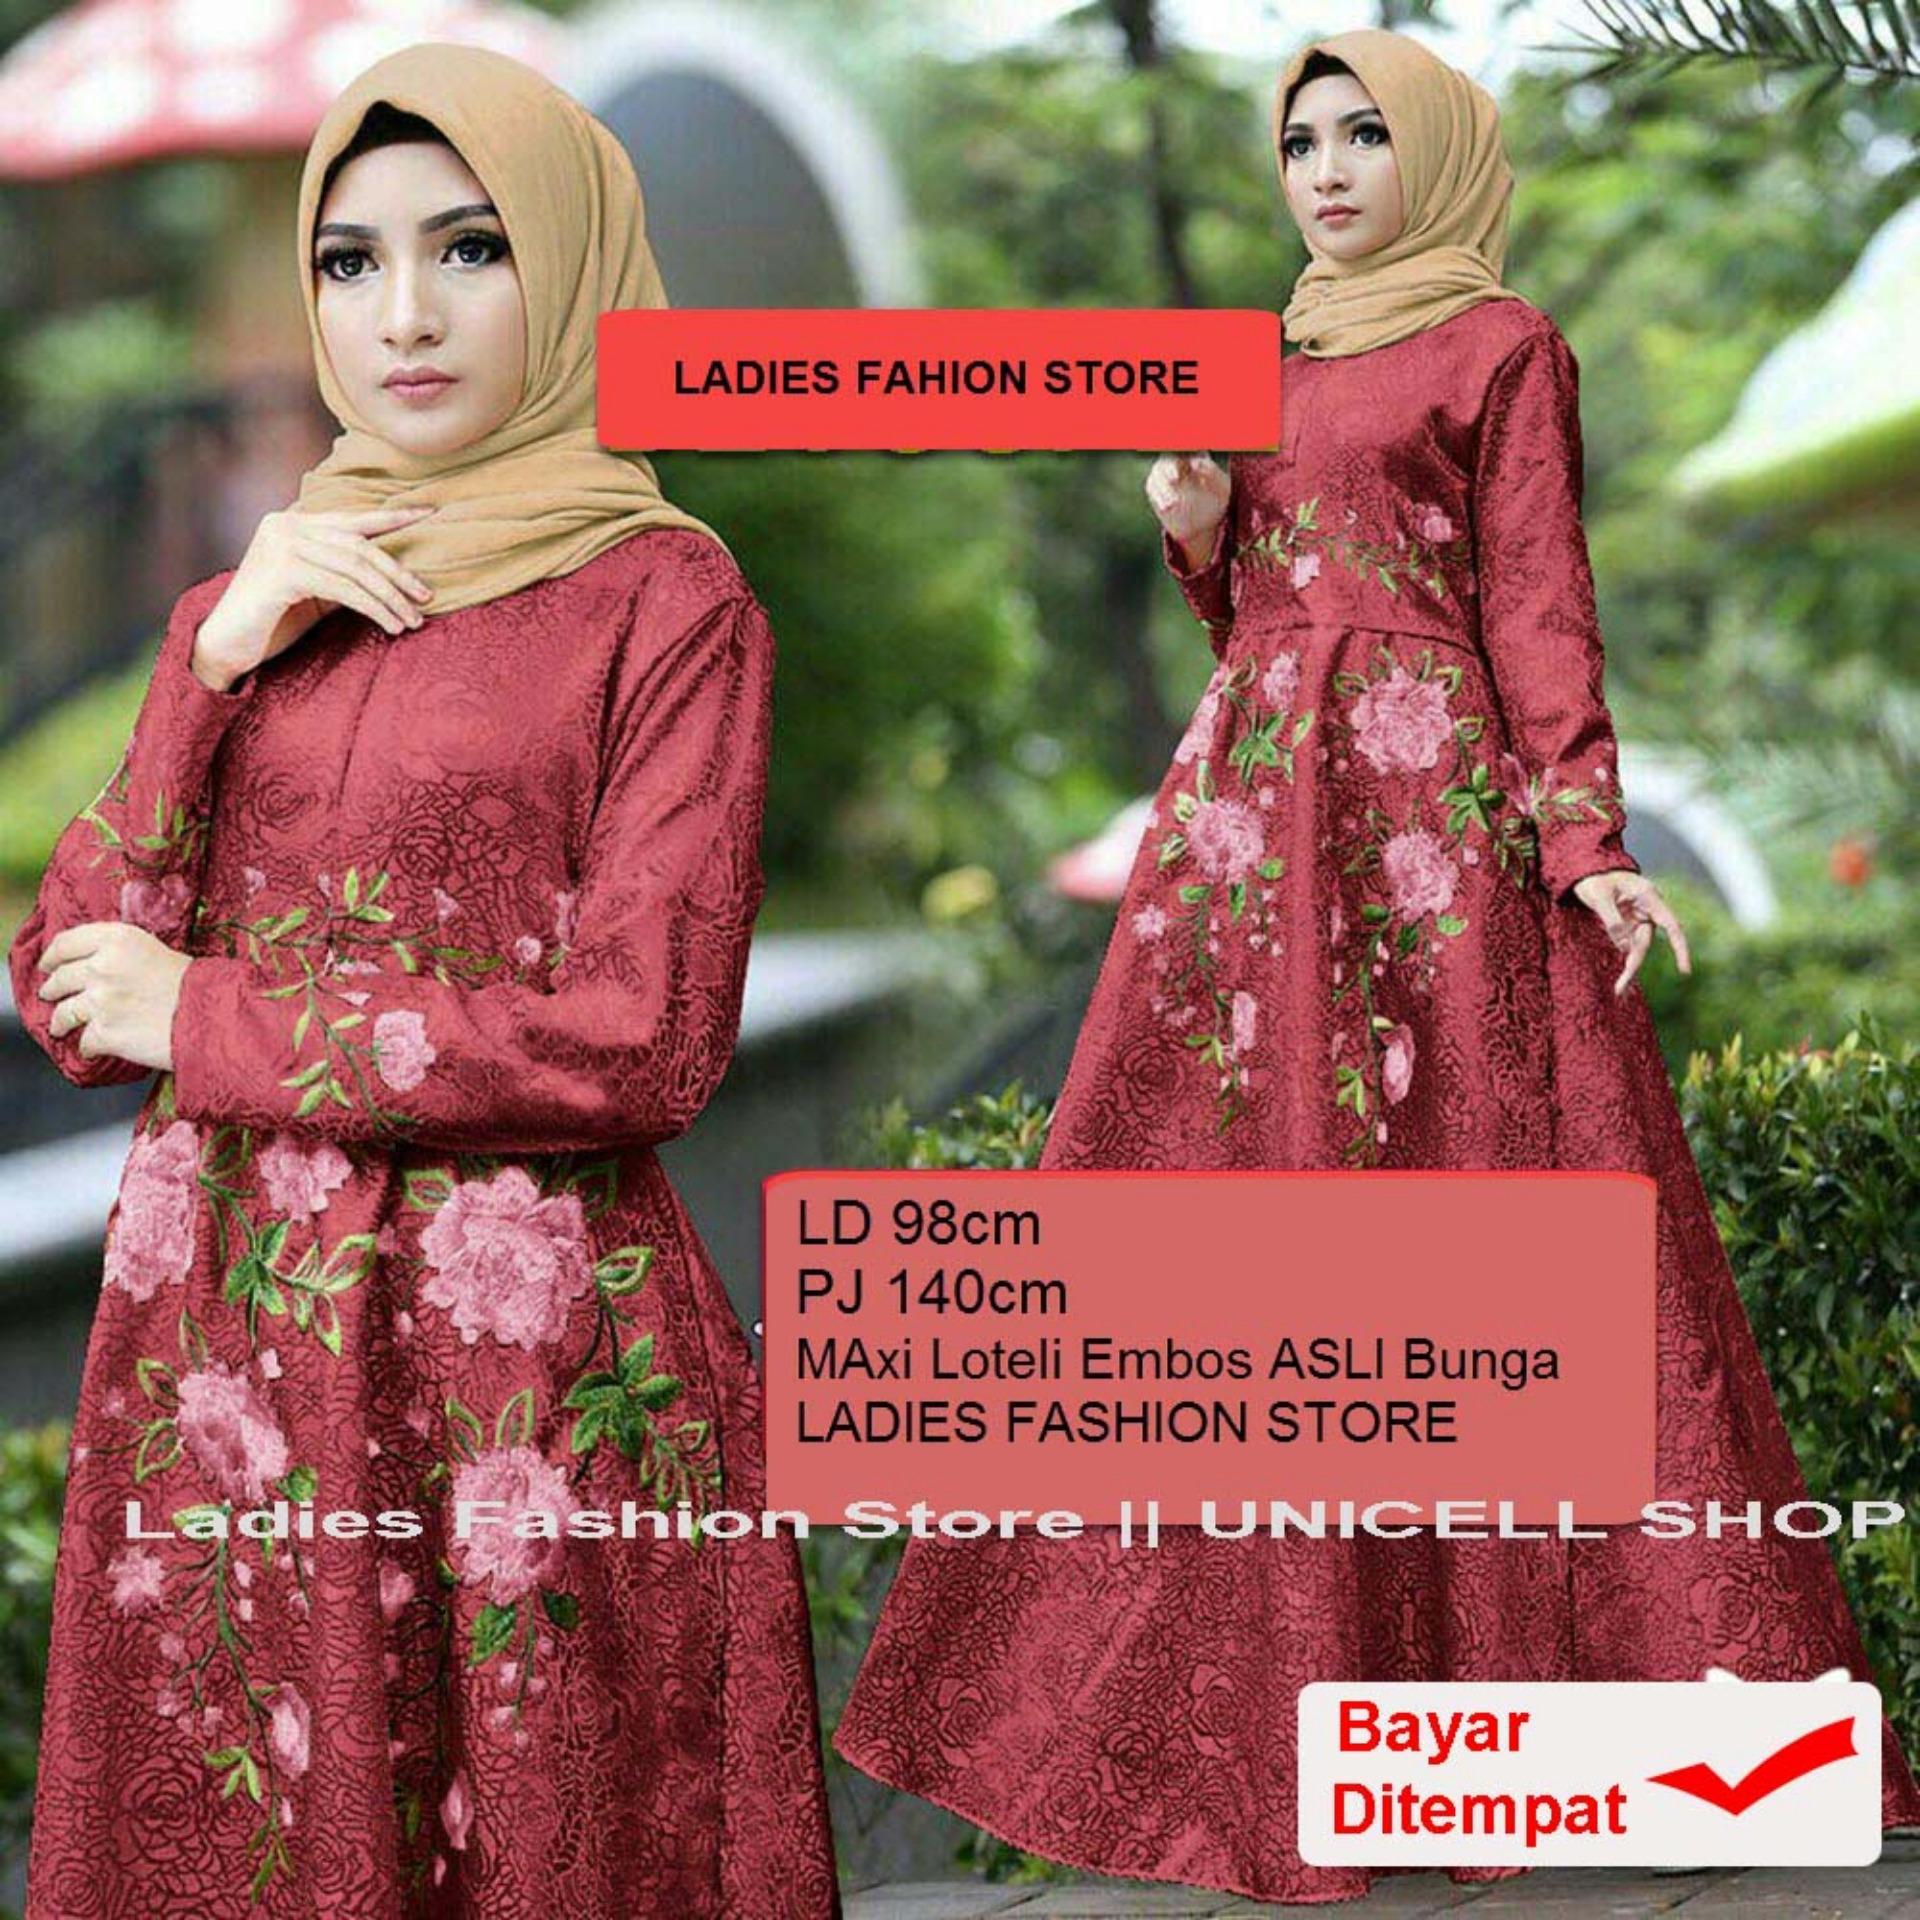 Baju Wanita Shop Dress Gamis Muslim Iyana/ Set Terusan Maxi Hijab Syar'i/ Syari Simple Elegant / Baju Muslimah Wanita / Kebaya Modern Baloteli Tanpa Pasmina (anaay) SS - Maroon / Gaun Pesta